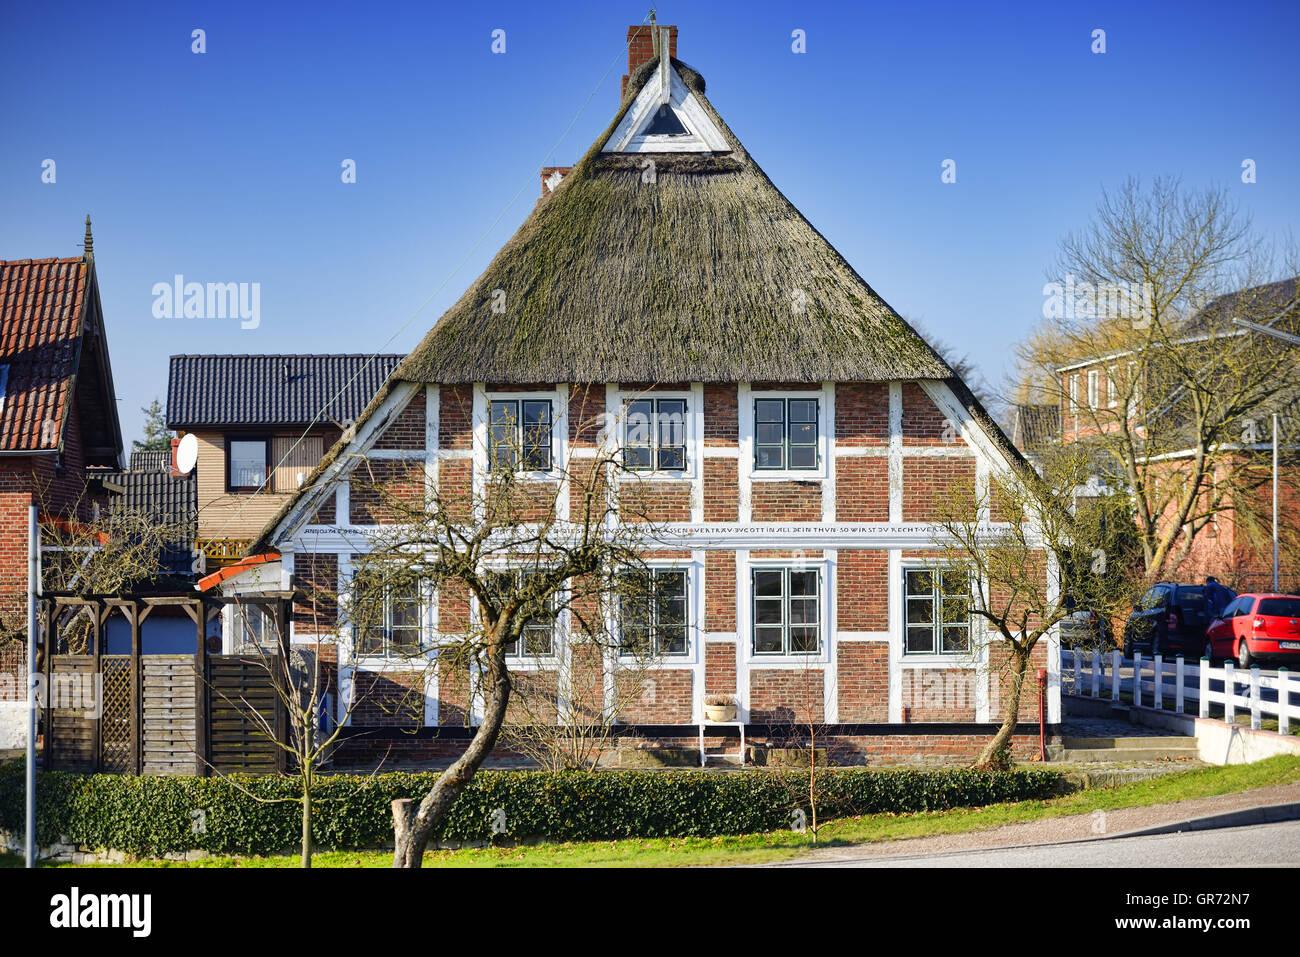 Half-Timbered House In Hamburg, Germany - Stock Image